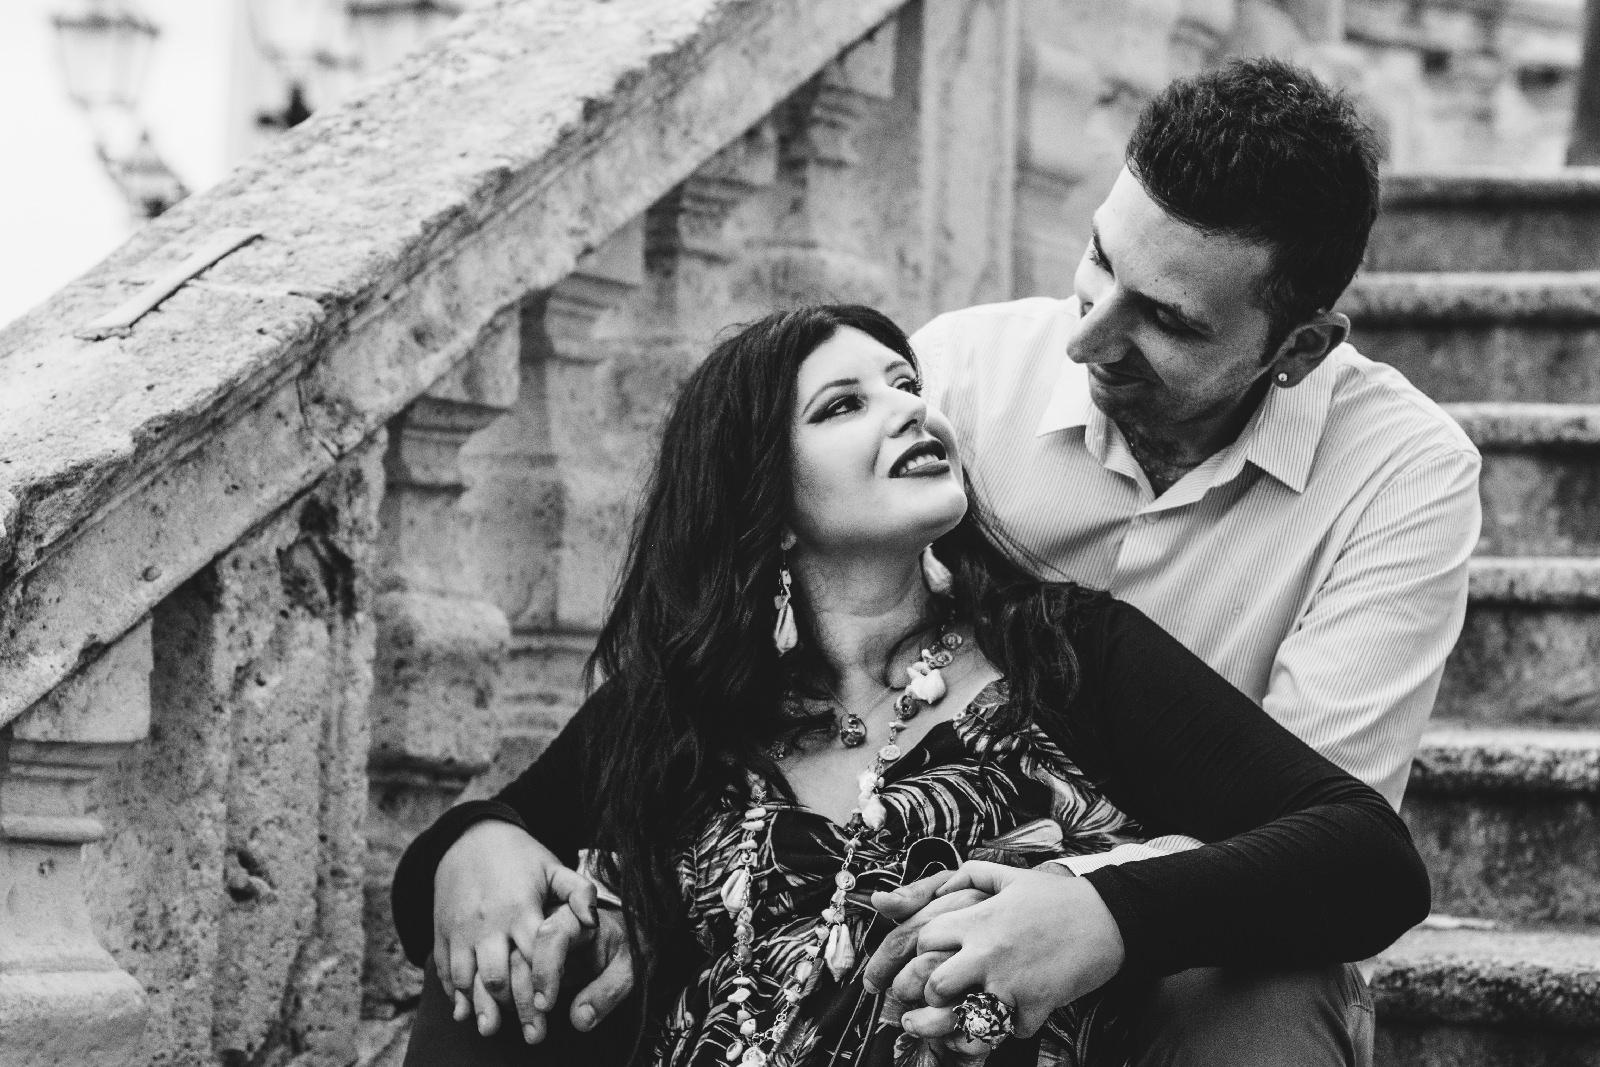 084-2018-09-22-Engagement-Alessandra-e-Igor-Pizzone-092